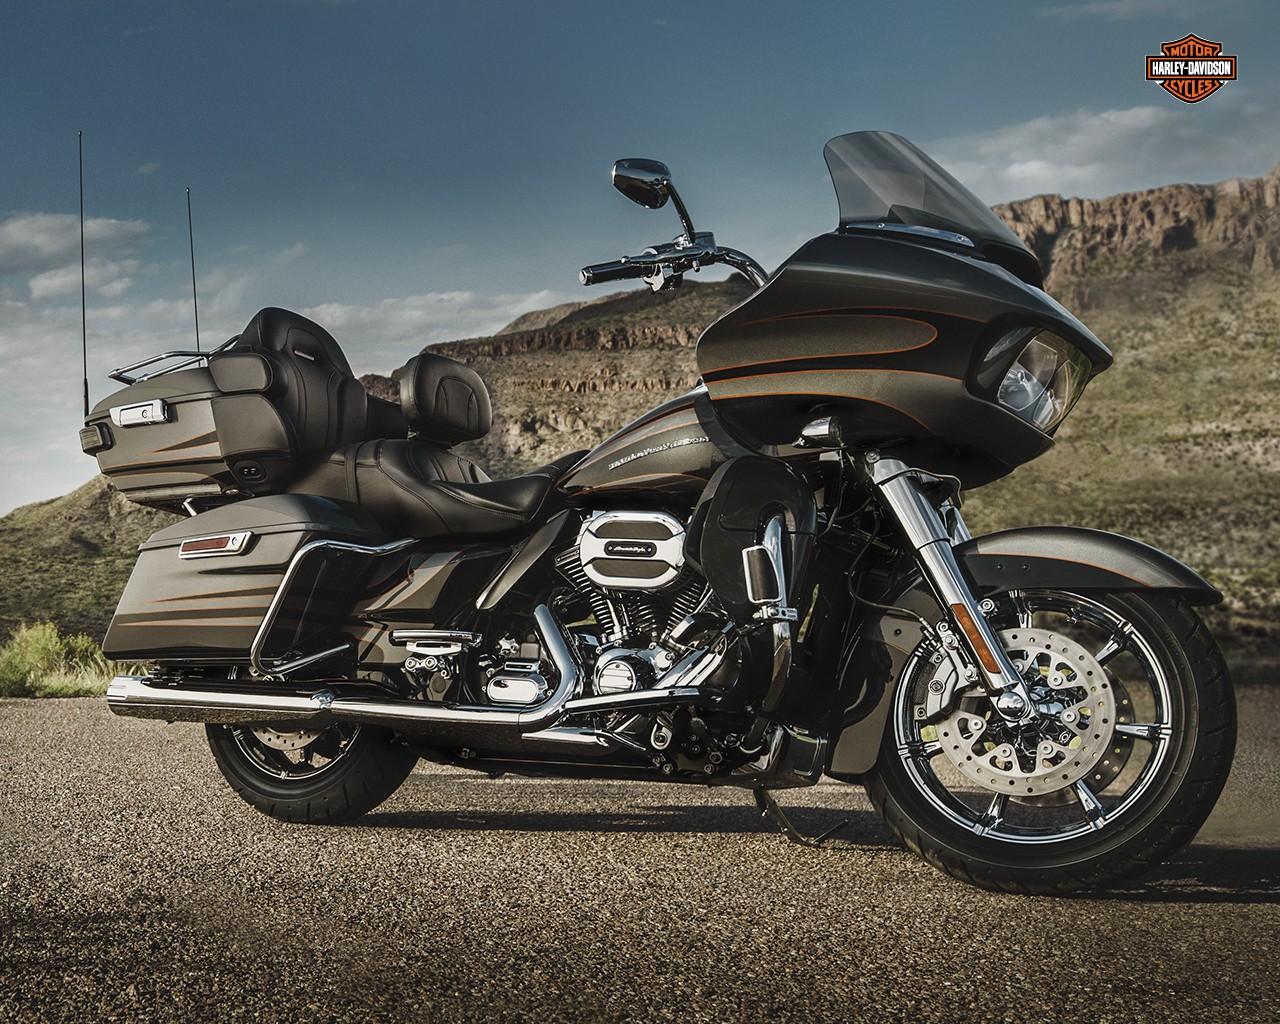 1280x1024px 2016 Harley Davidson HD Wallpapers